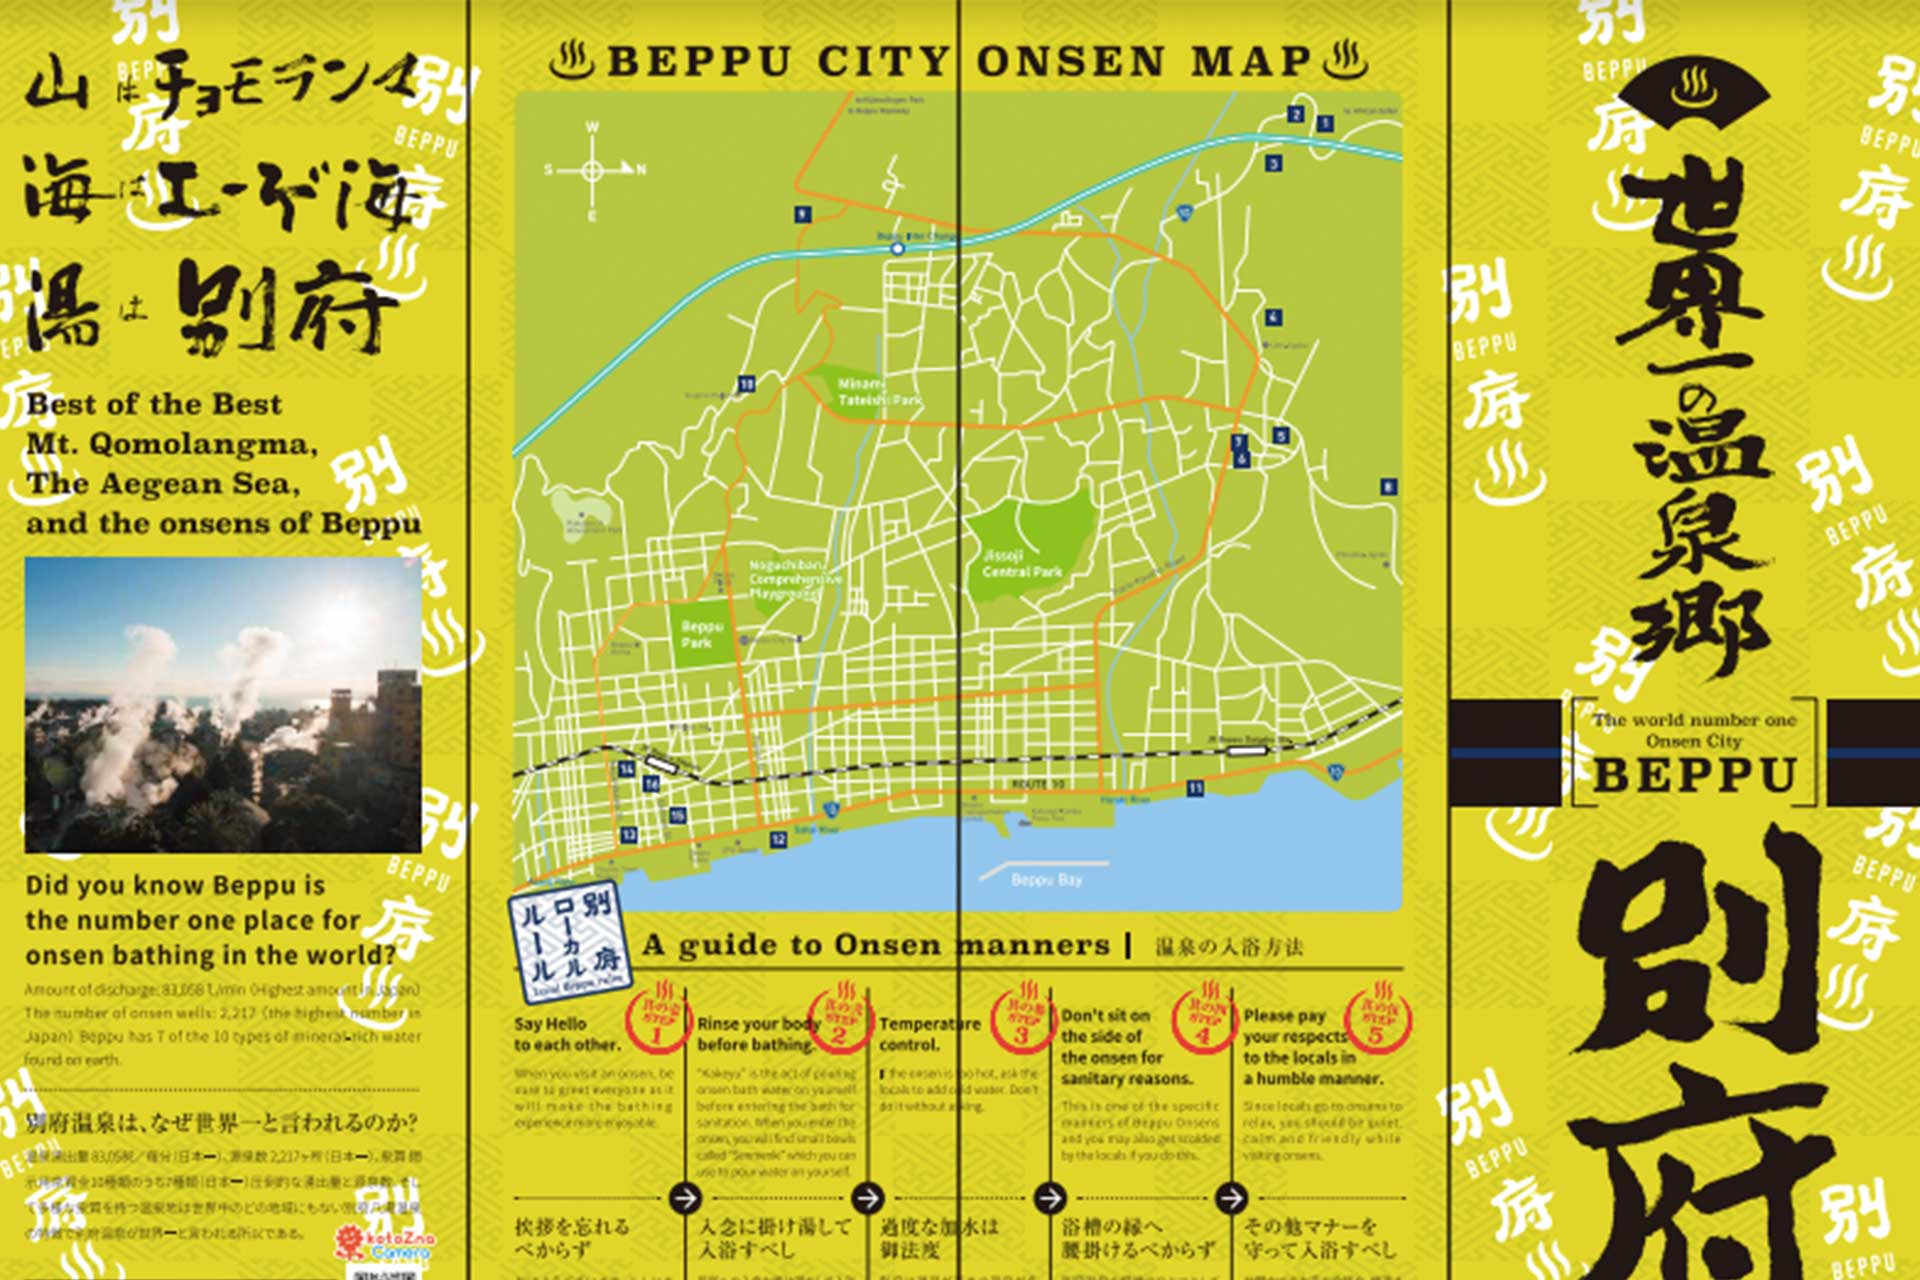 beppu onsen tattoo map1